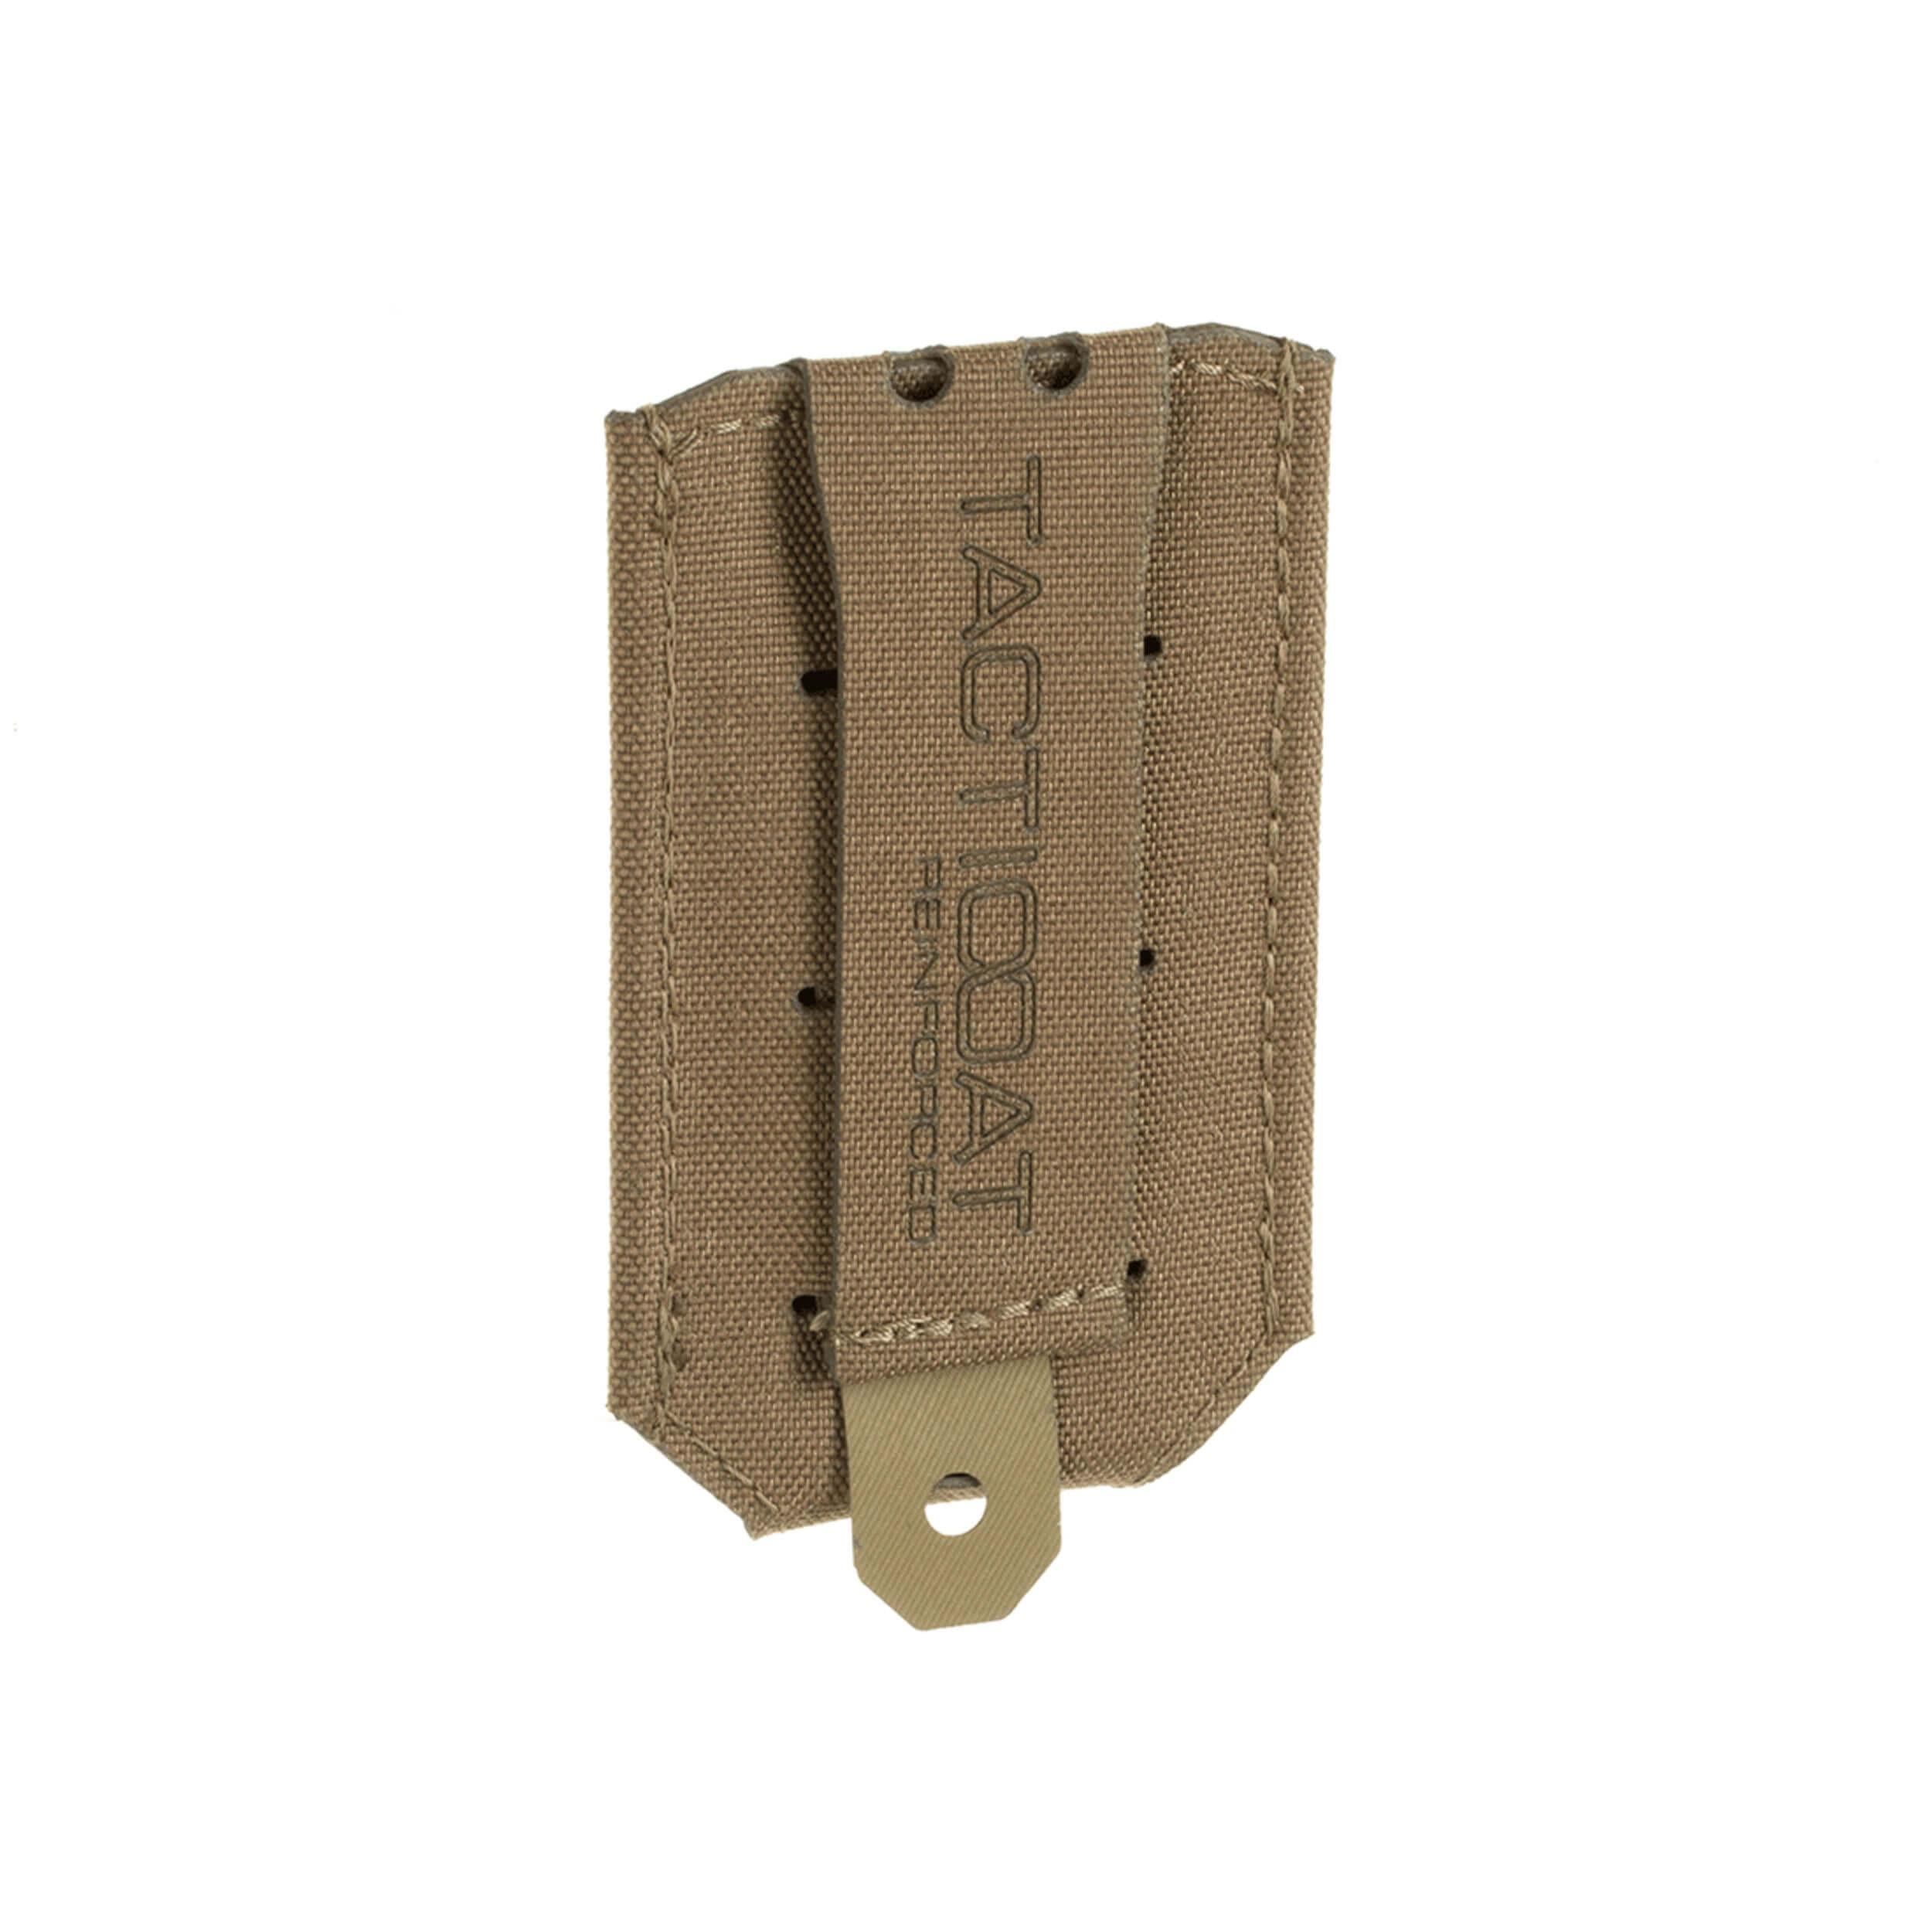 Clawgear 9mm Low Profile Magazin Tasche Coyote